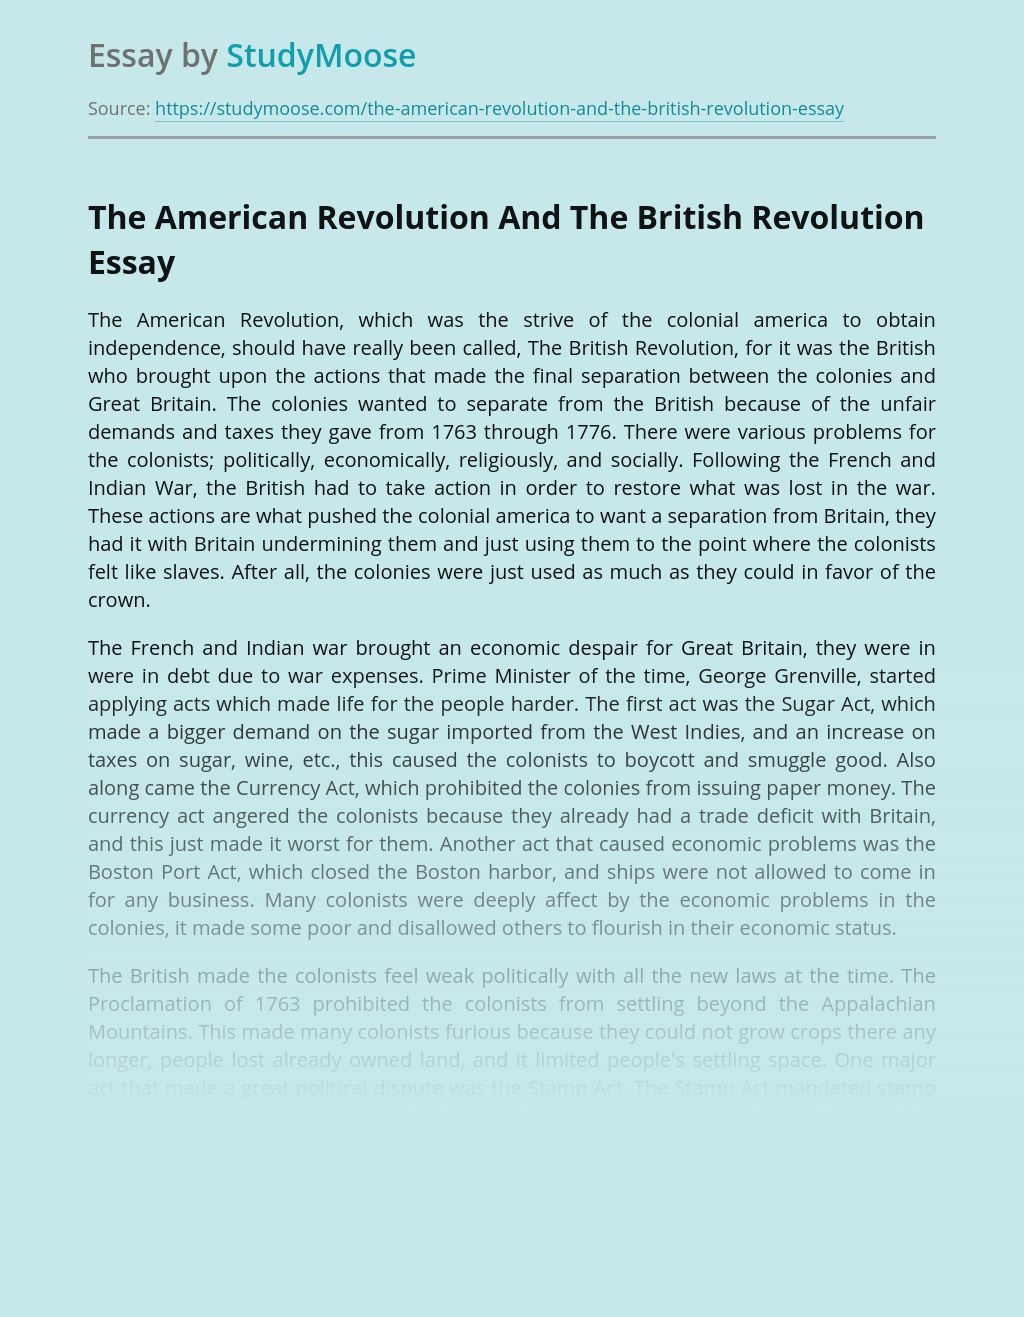 The American Revolution And The British Revolution